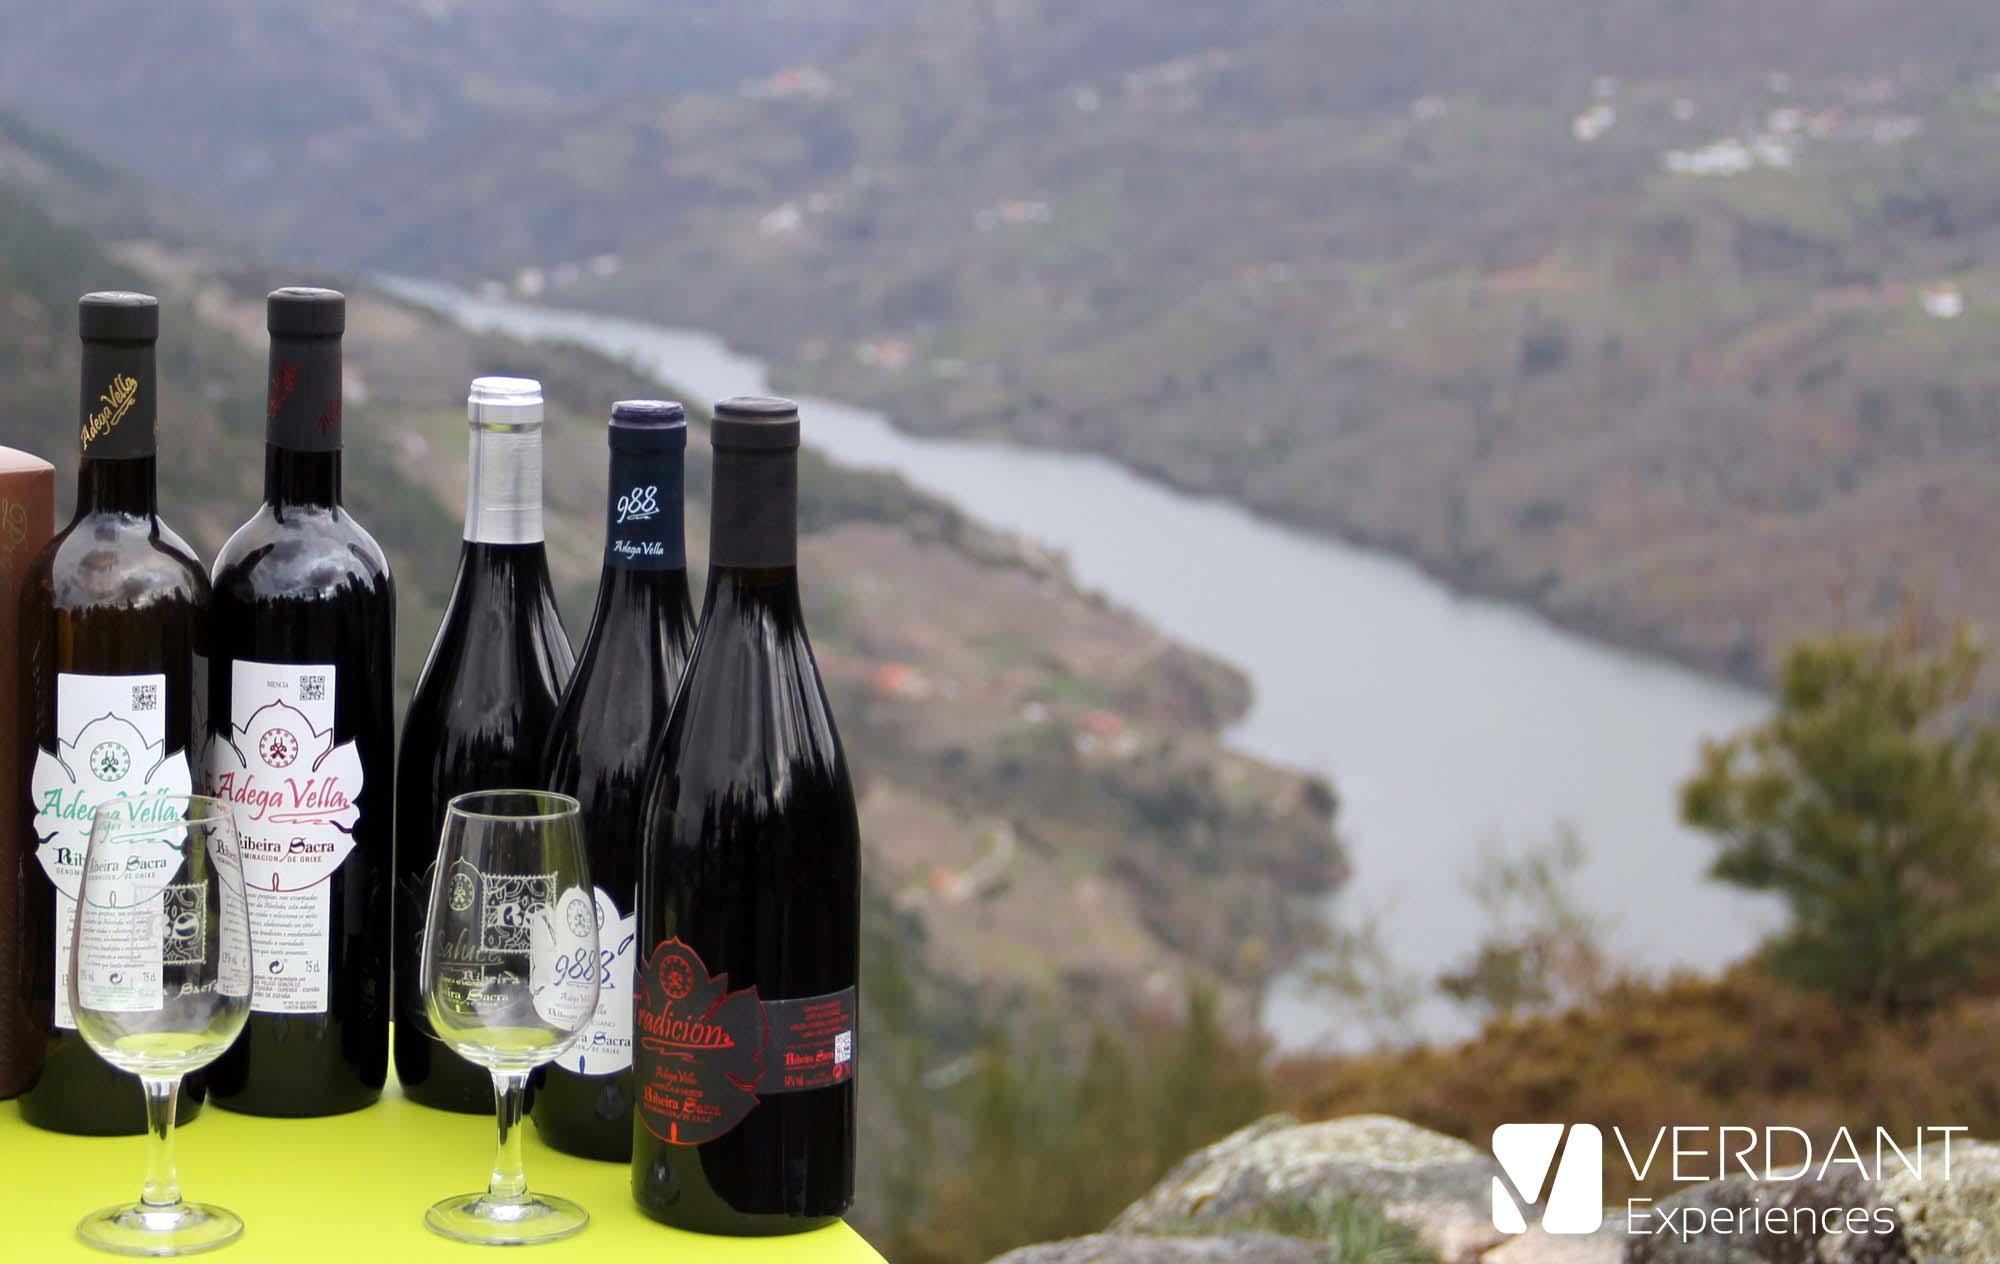 Wineries from Ribeira Sacra: Adega Vella